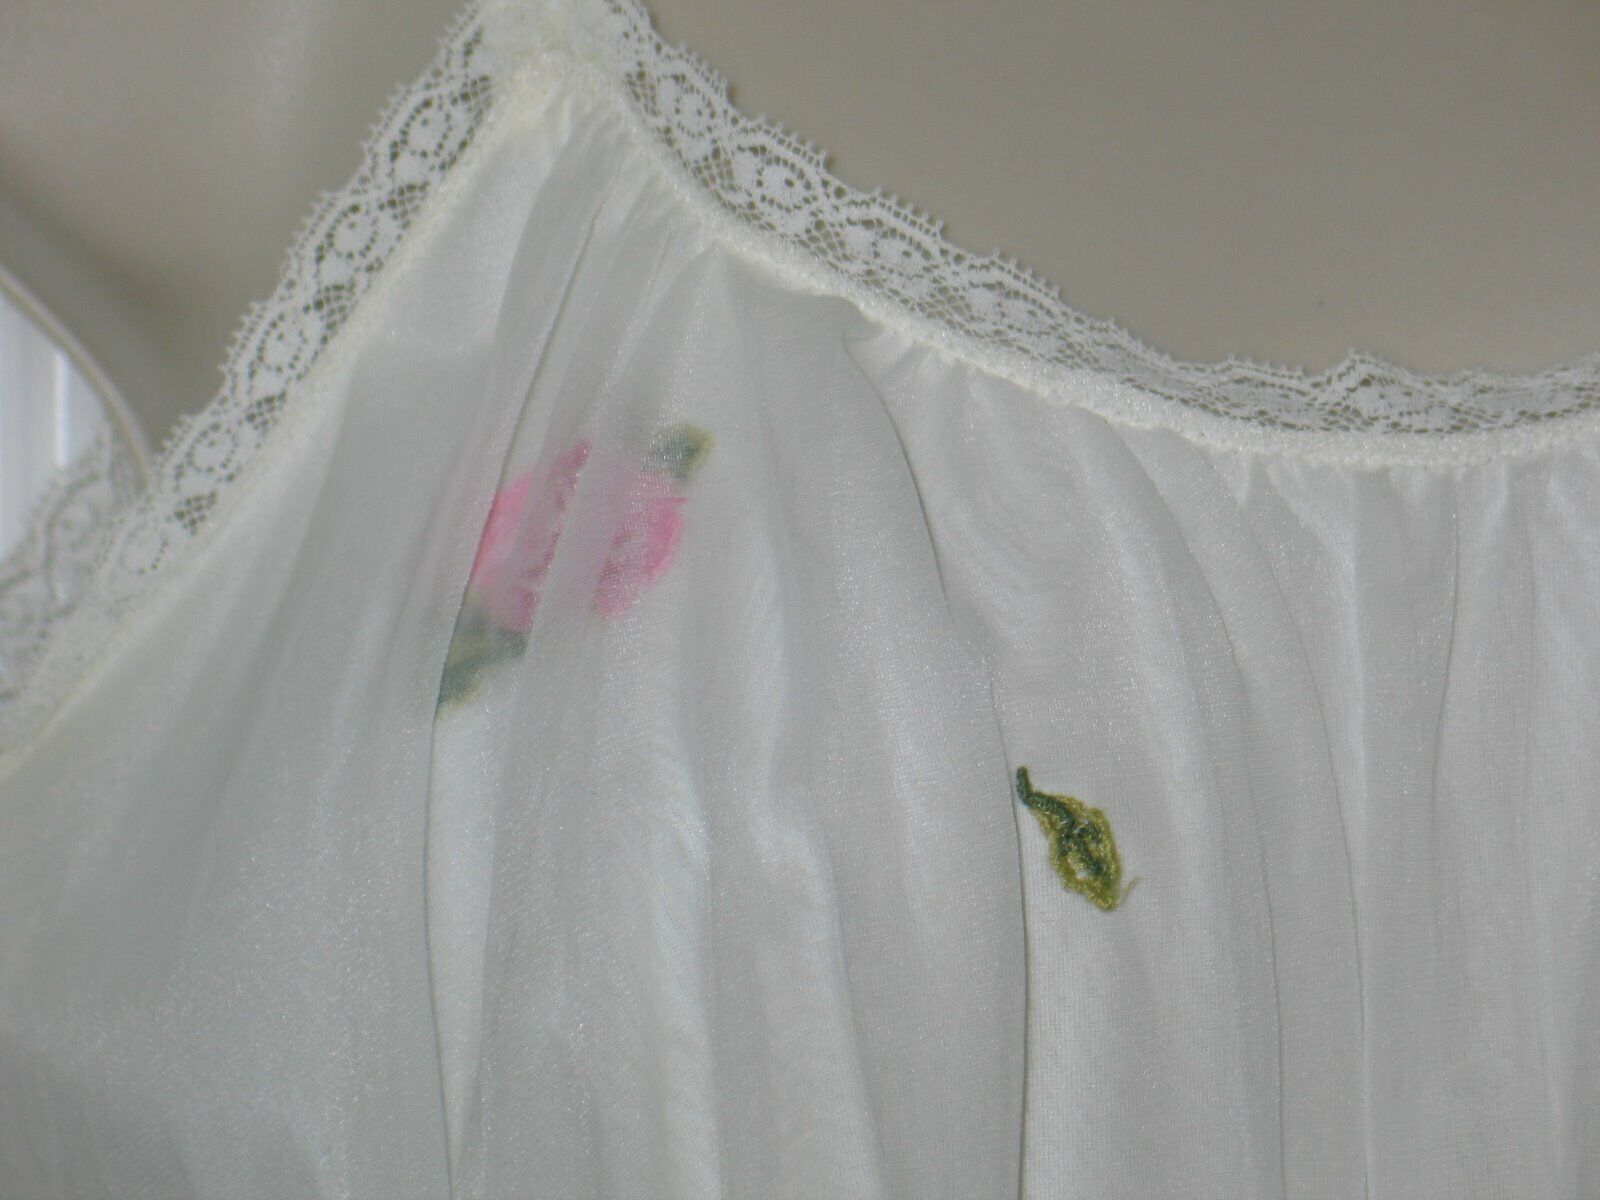 Vintage LAROS Slip  Lace Night Gown  1950s 1960s Full Slip Night Gown  White